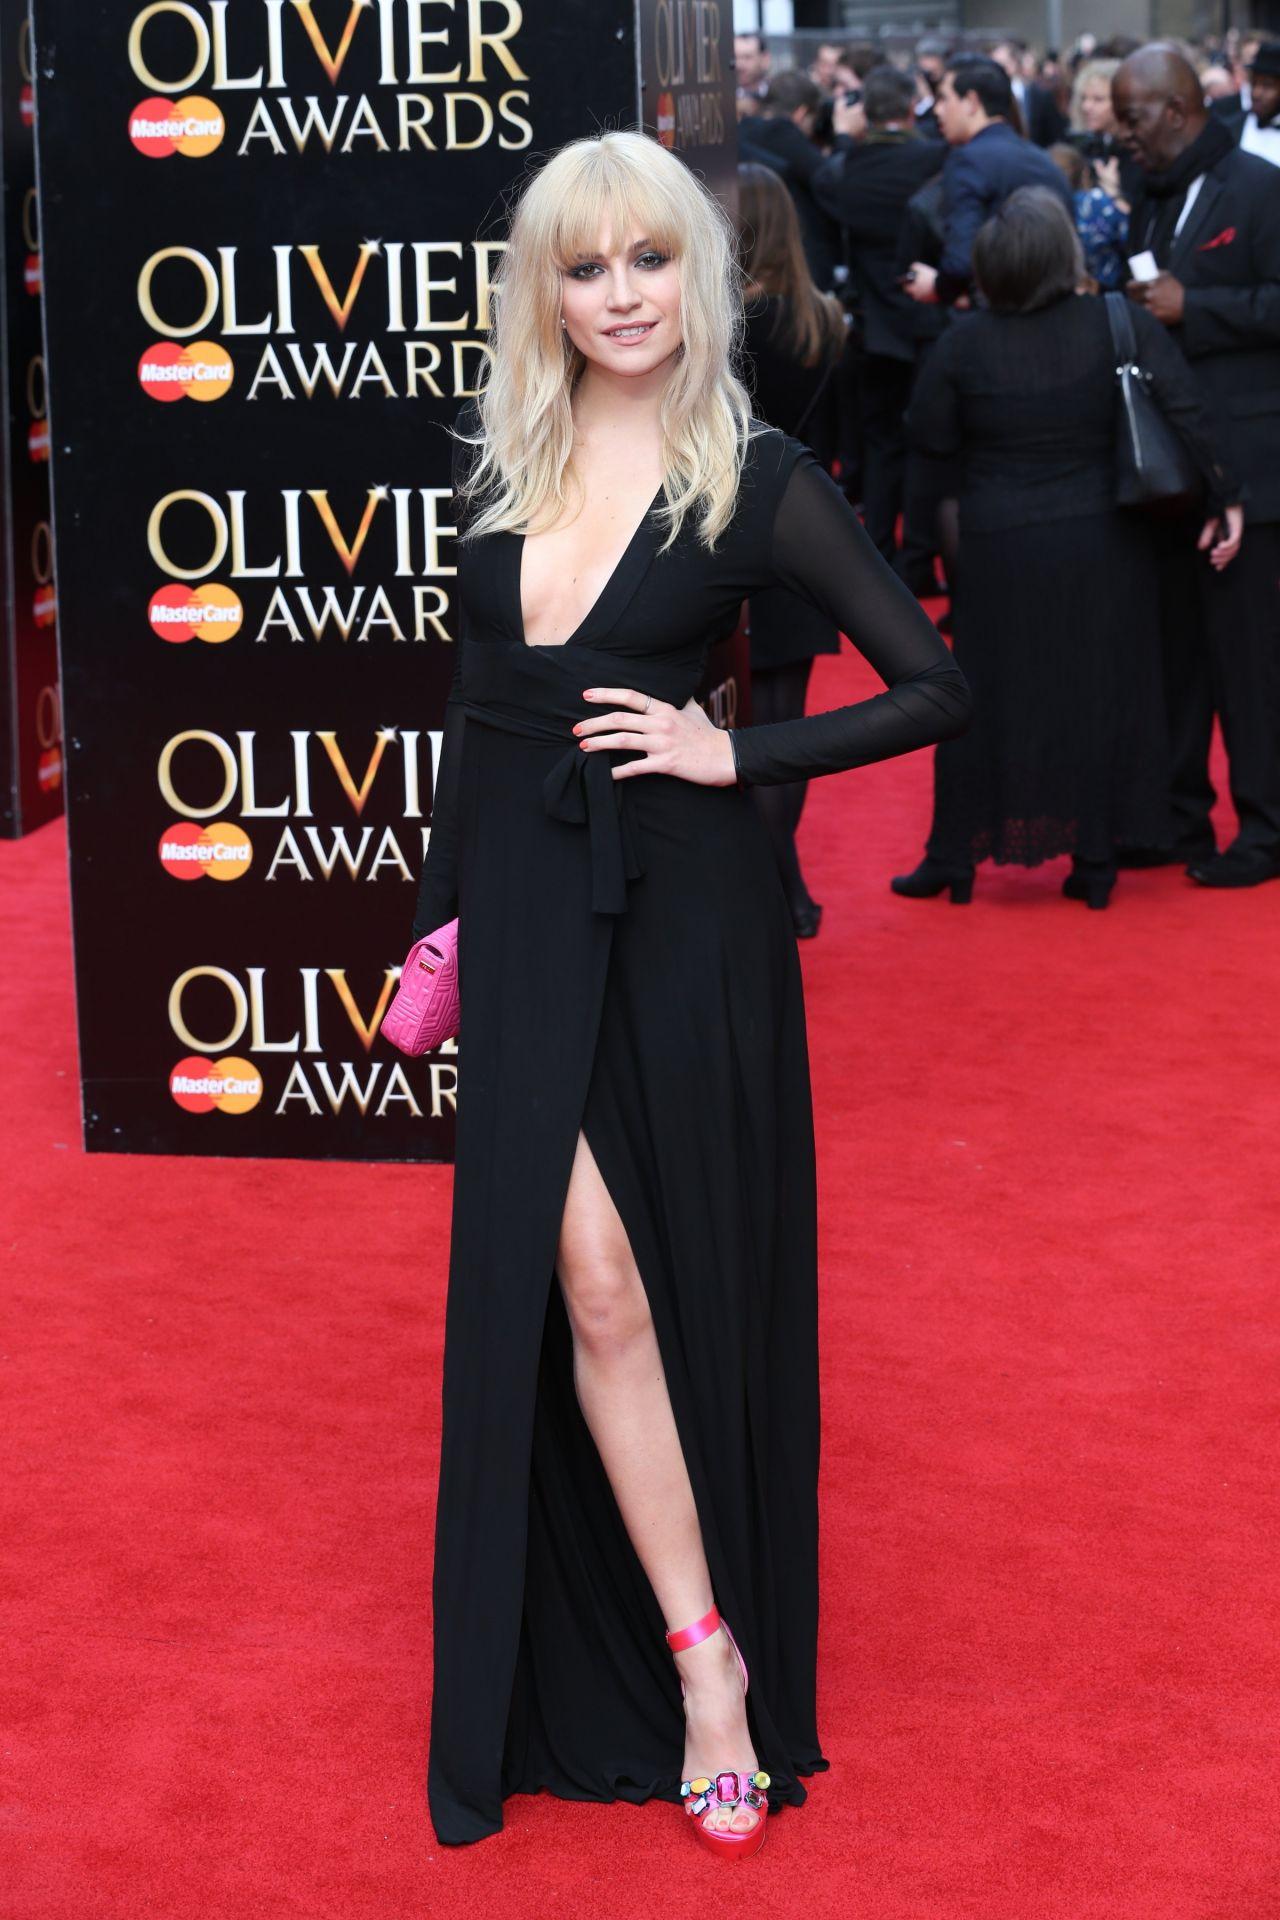 Pixie Lott – 2015 Olivier Awards in London